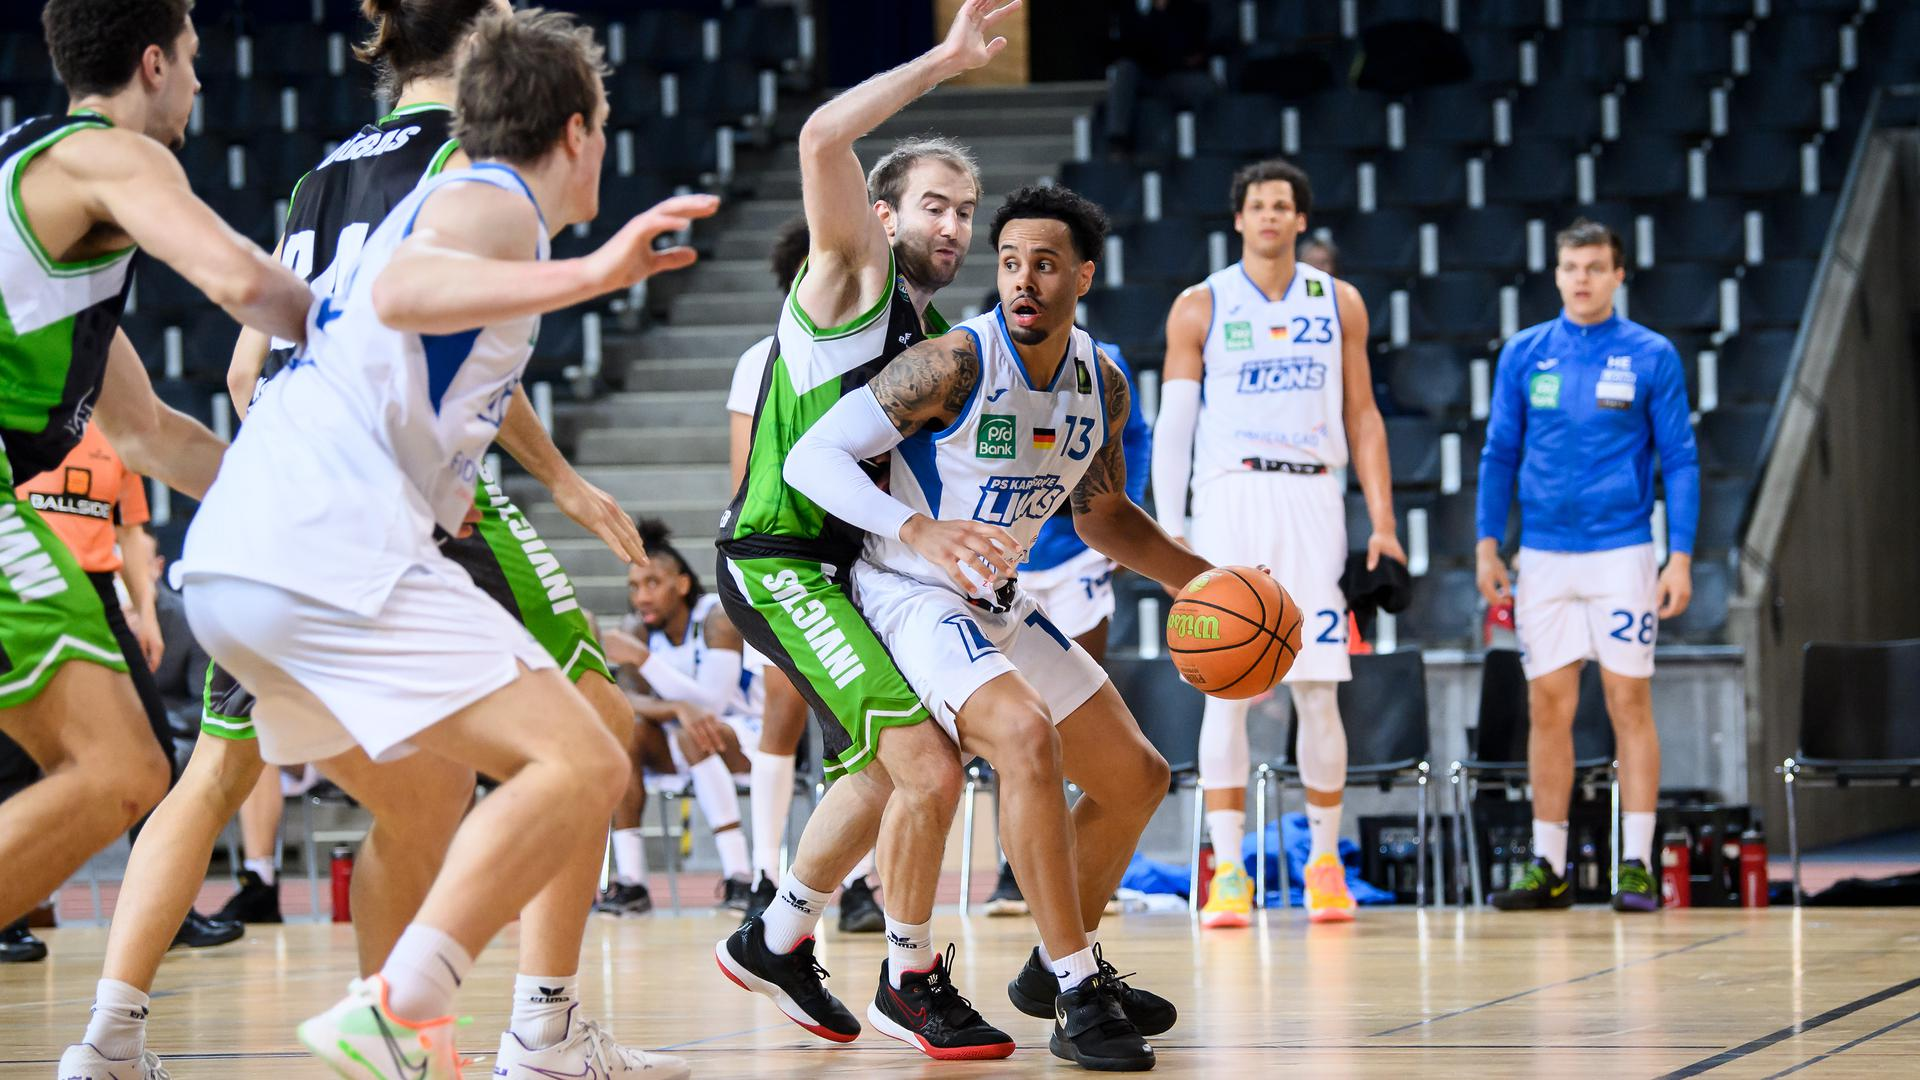 Daniel Alexander Norl (Lions) im Zweikampf mit Kevin Smit (Trier).  GES/ Basketball/ ProA: PSK Lions - Gladiators Trier, 05.04.2021 --